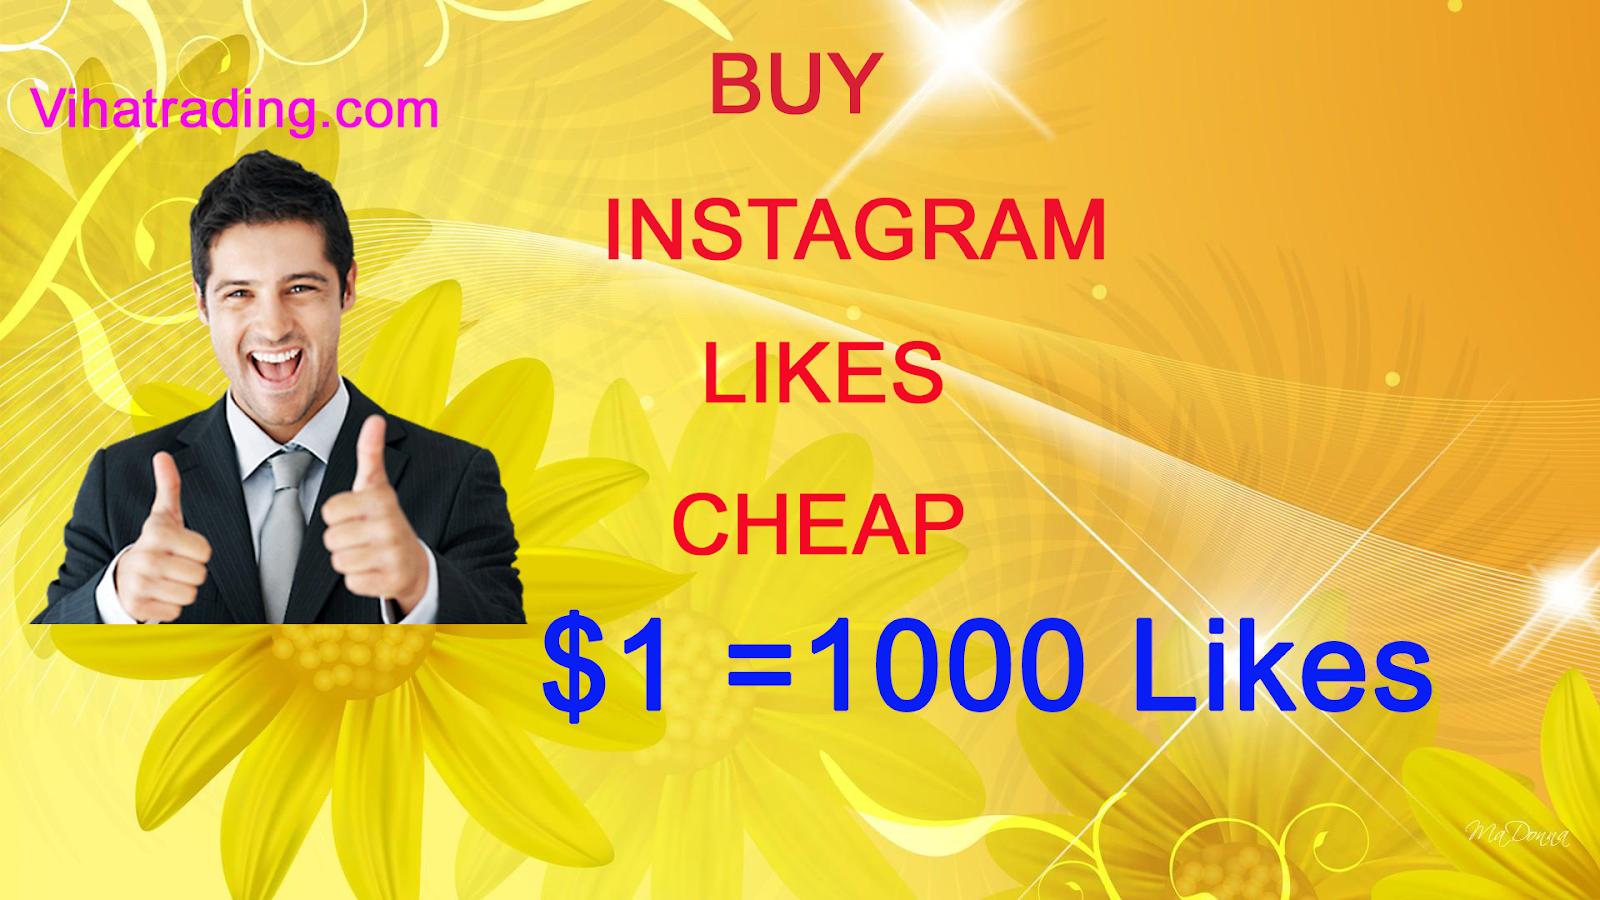 Buy Instagram Likes Cheap  Vihatrading